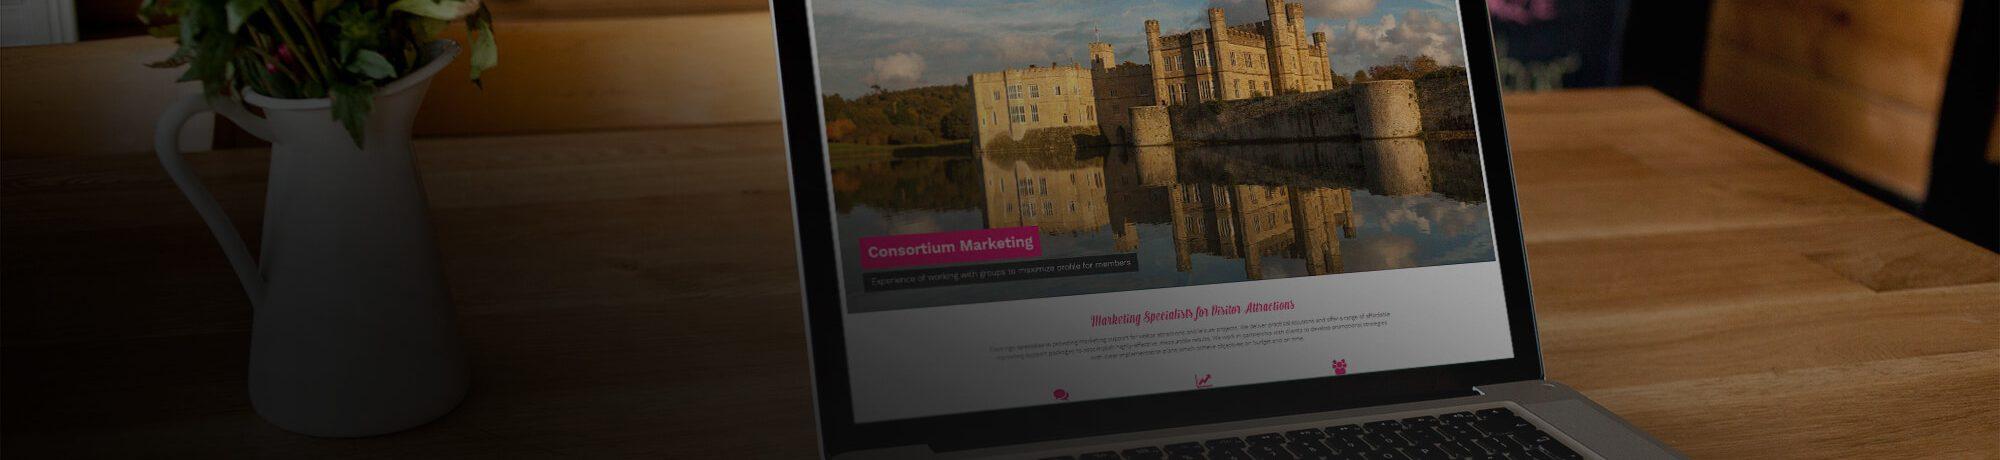 flamingo marketing website main 2000x460 - Flamingo Marketing